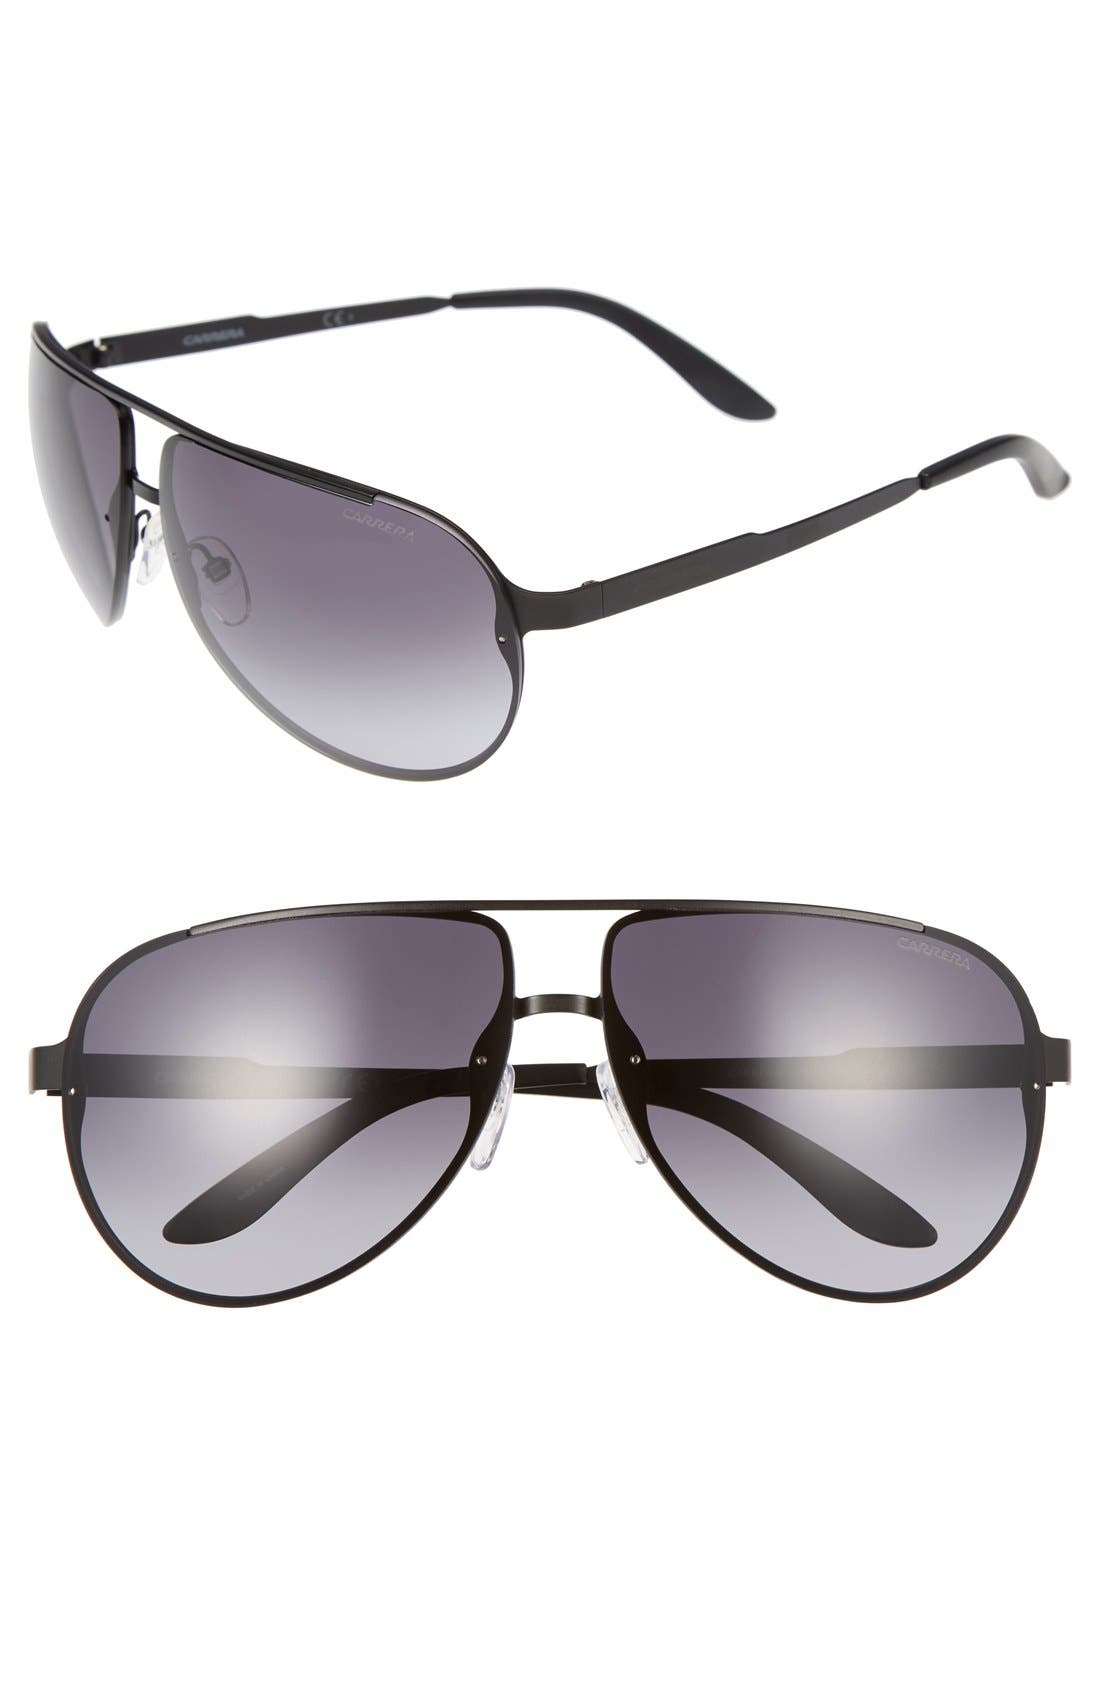 CA102 65mm Aviator Sunglasses,                             Main thumbnail 1, color,                             001